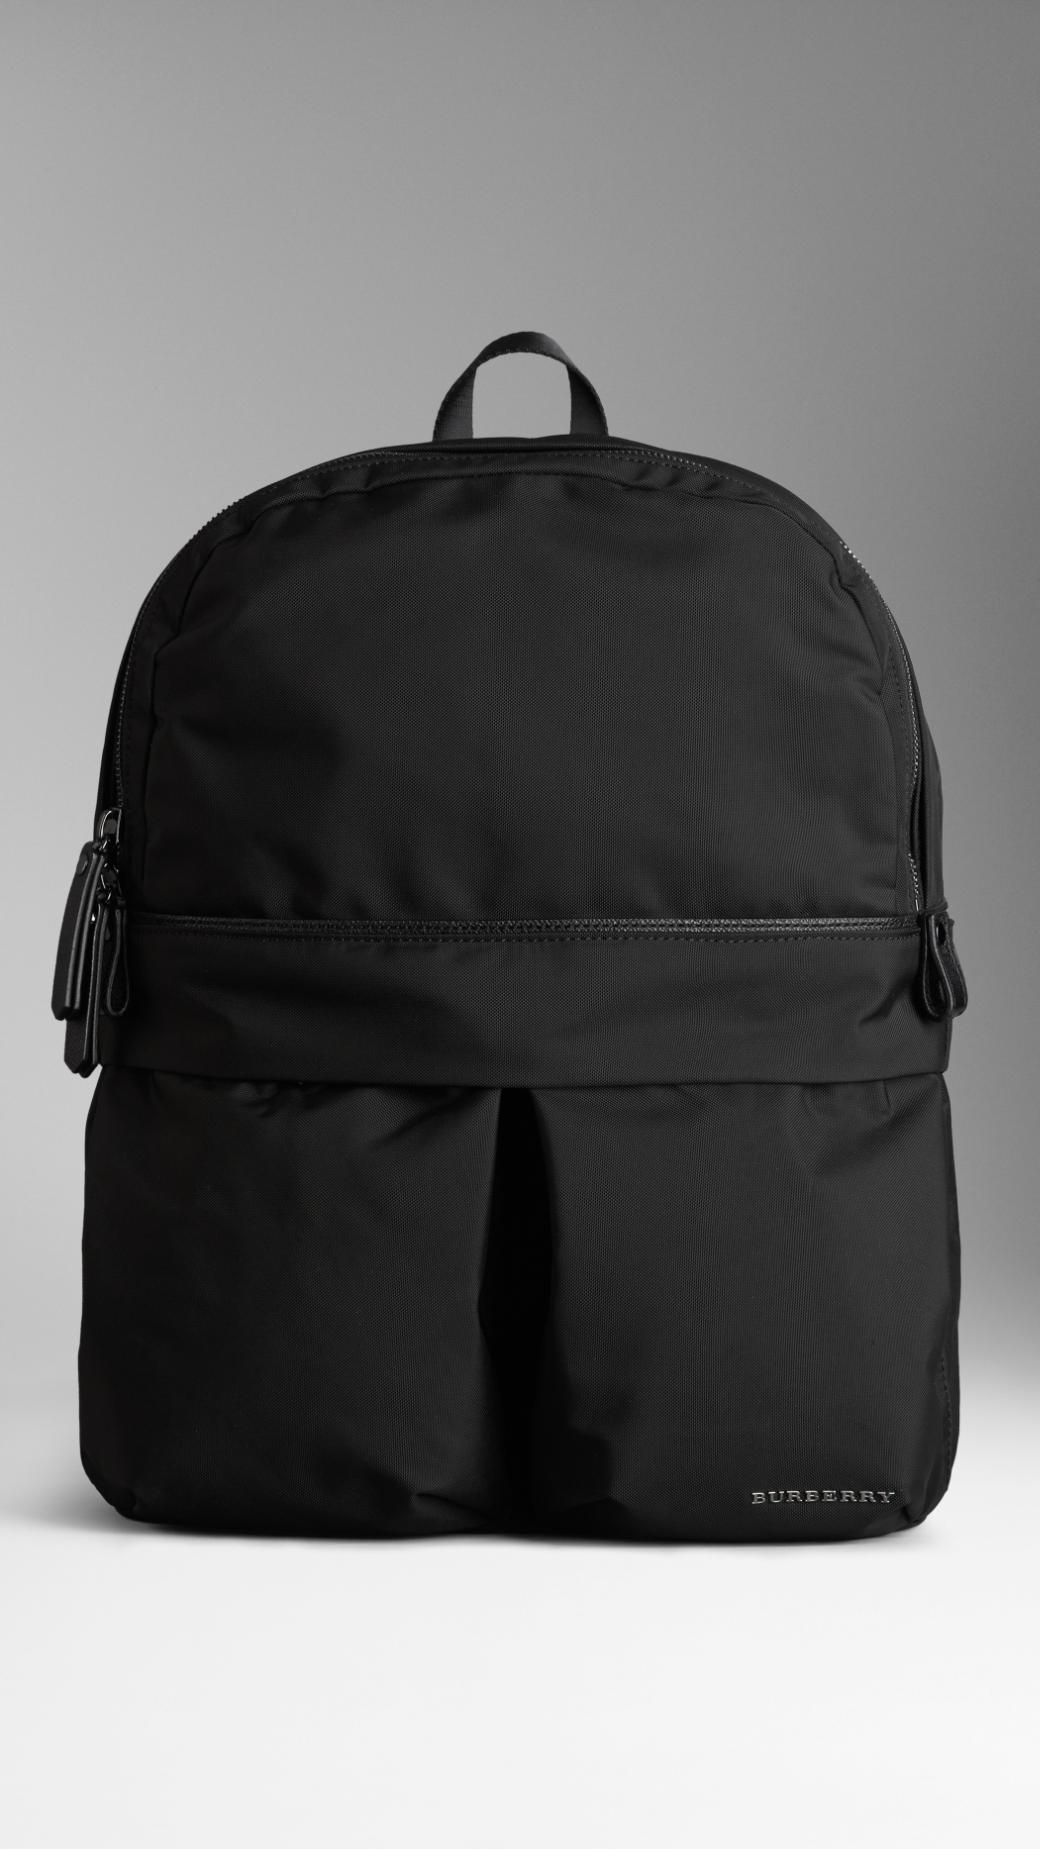 Lyst Burberry Leather Detail Nylon Backpack In Black For Men